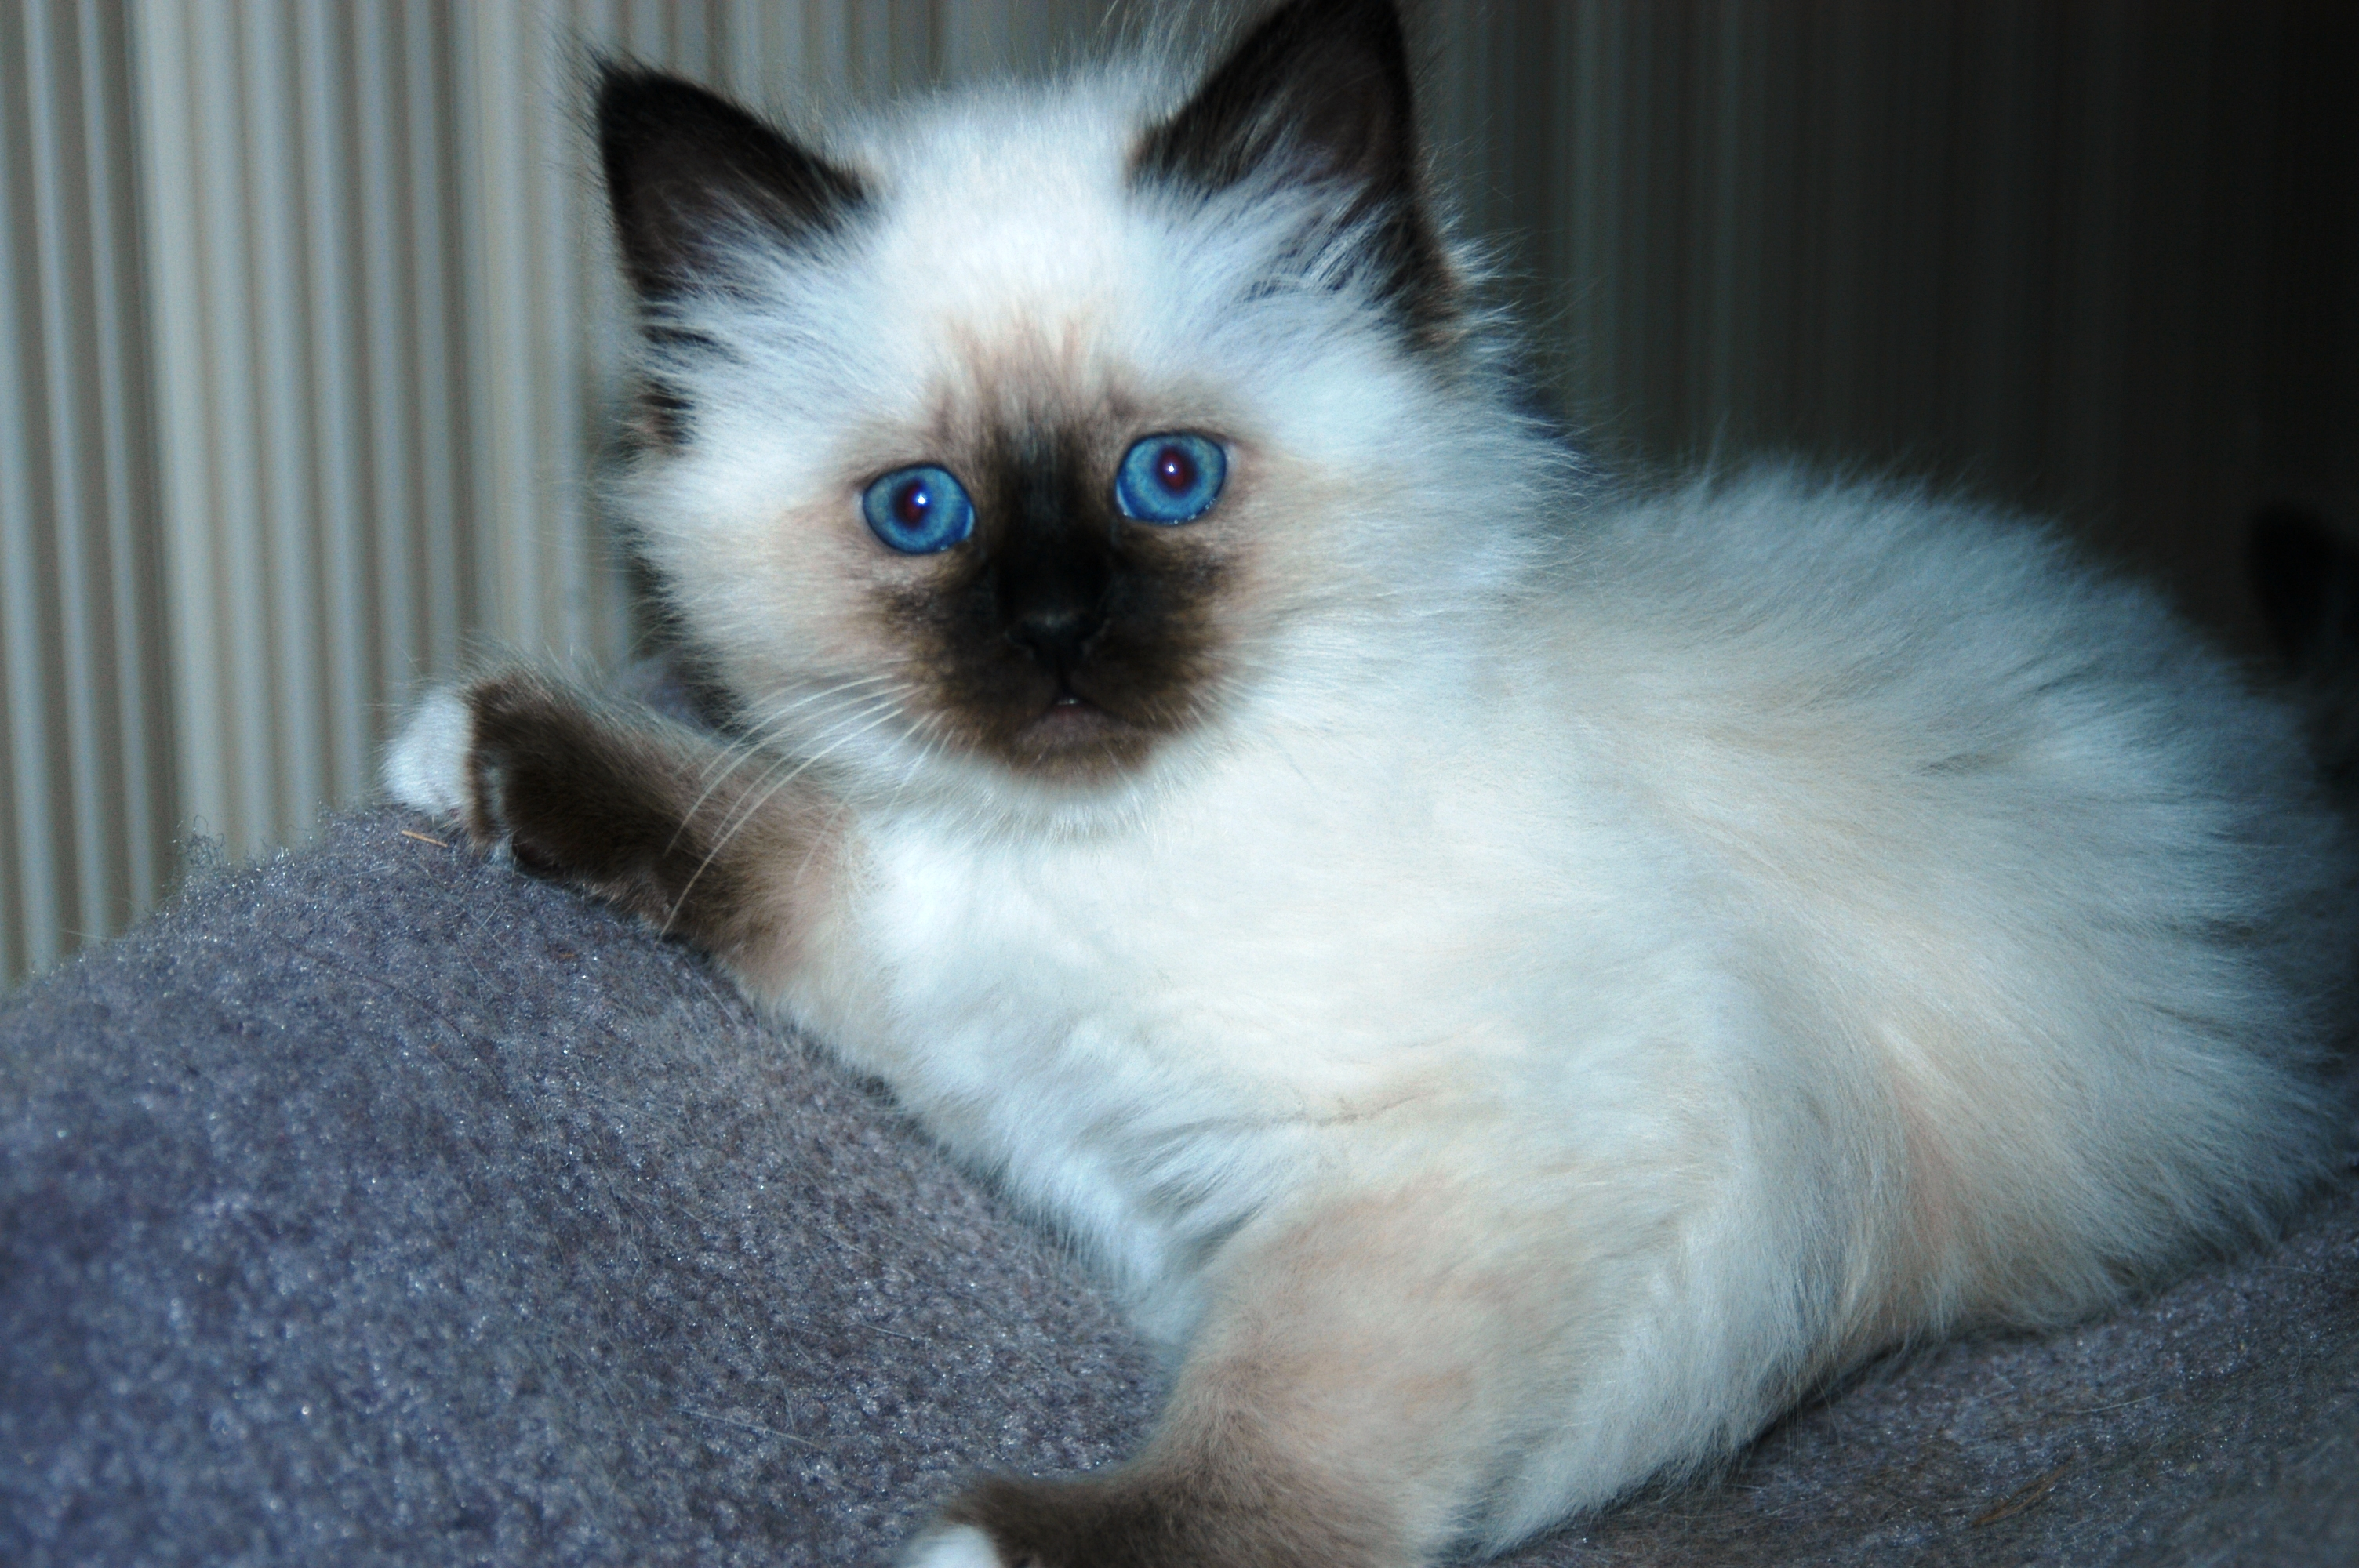 20 Best Of Kittens for Sale In Ri | Kittens cute wallpapers